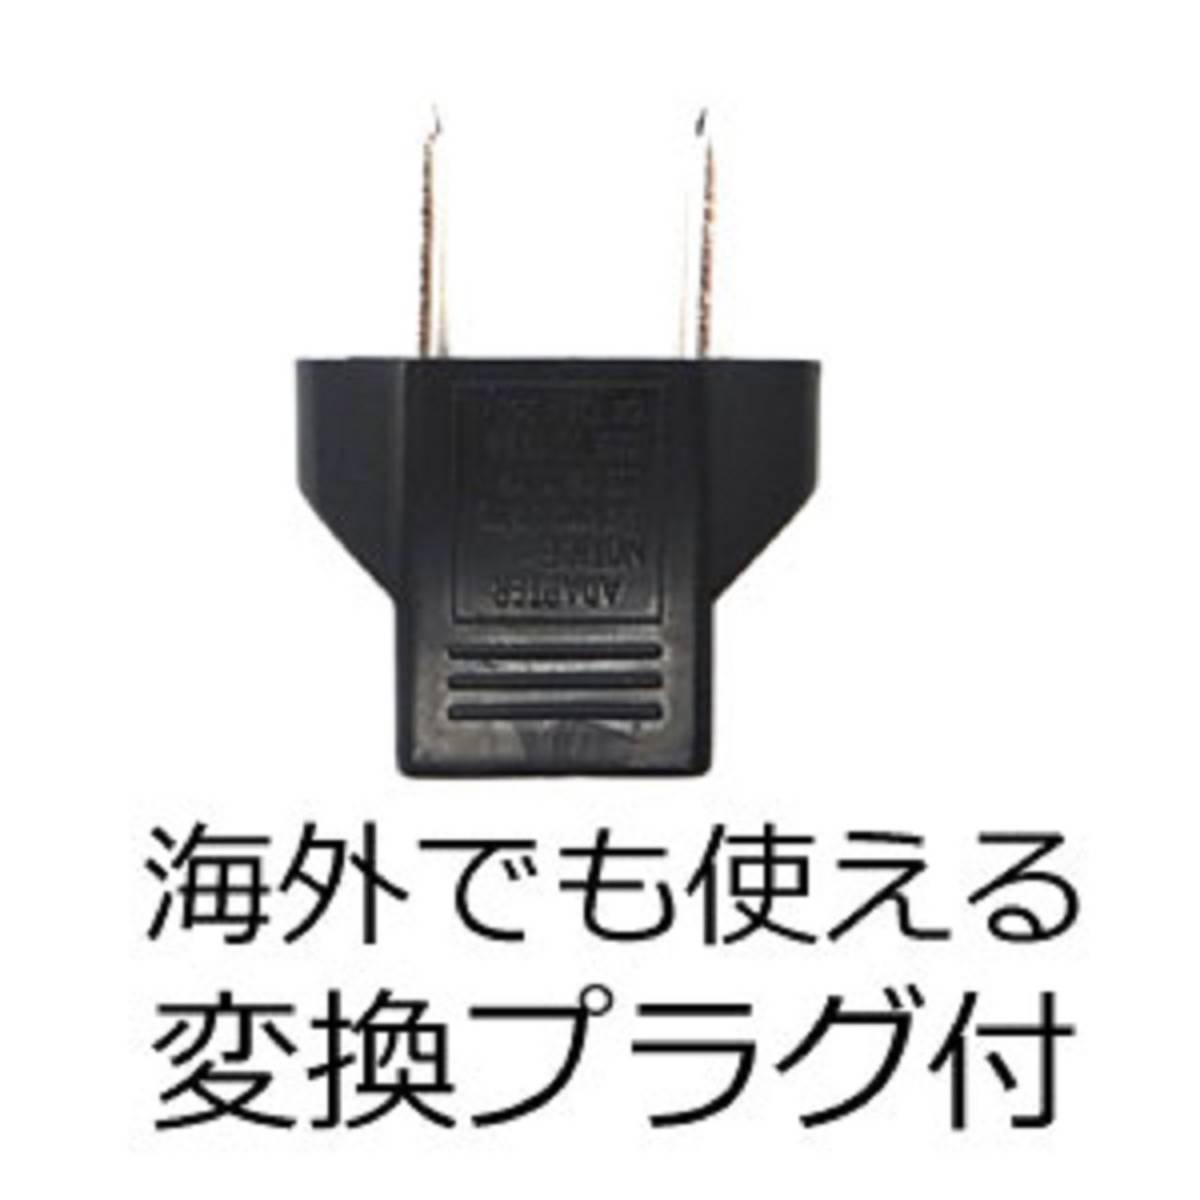 Panasonicパナソニック VW-VBK180互換プレミアム充電器HDC-TM70/HDC-TM60/HDC-HS60/HDC-TM35/HDC-TM90/HDC-TM95/HDC-TM85/HDC-TM45_画像3